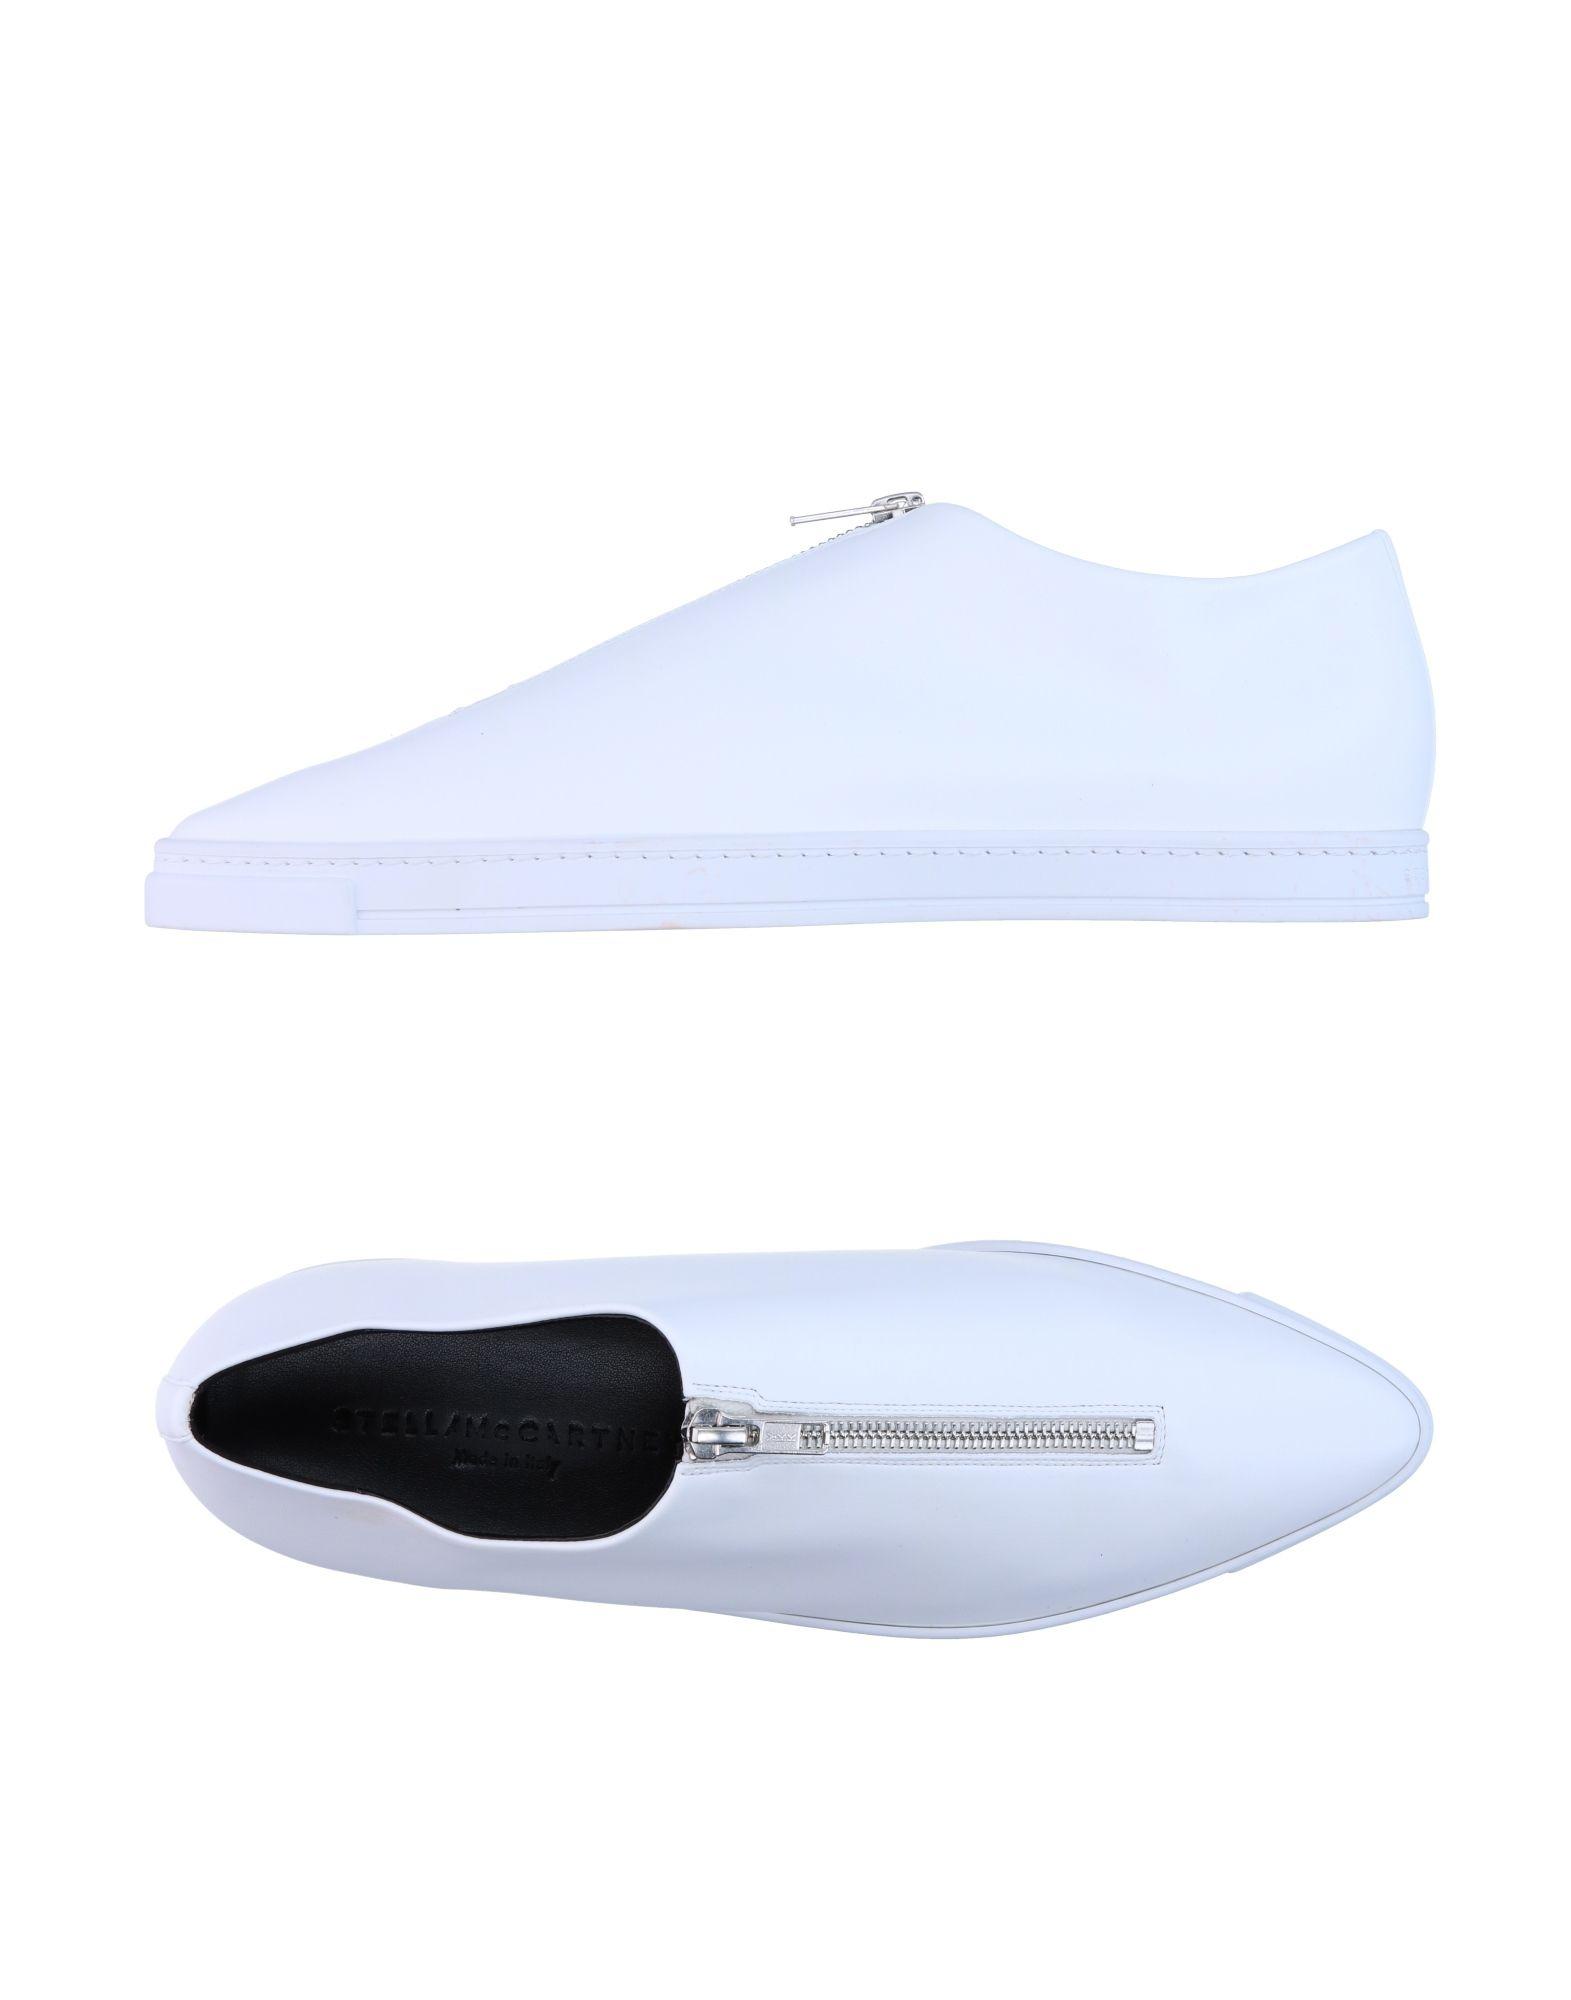 Rabatt Schuhe Stella Mccartney Sneakers Damen  11260942LR